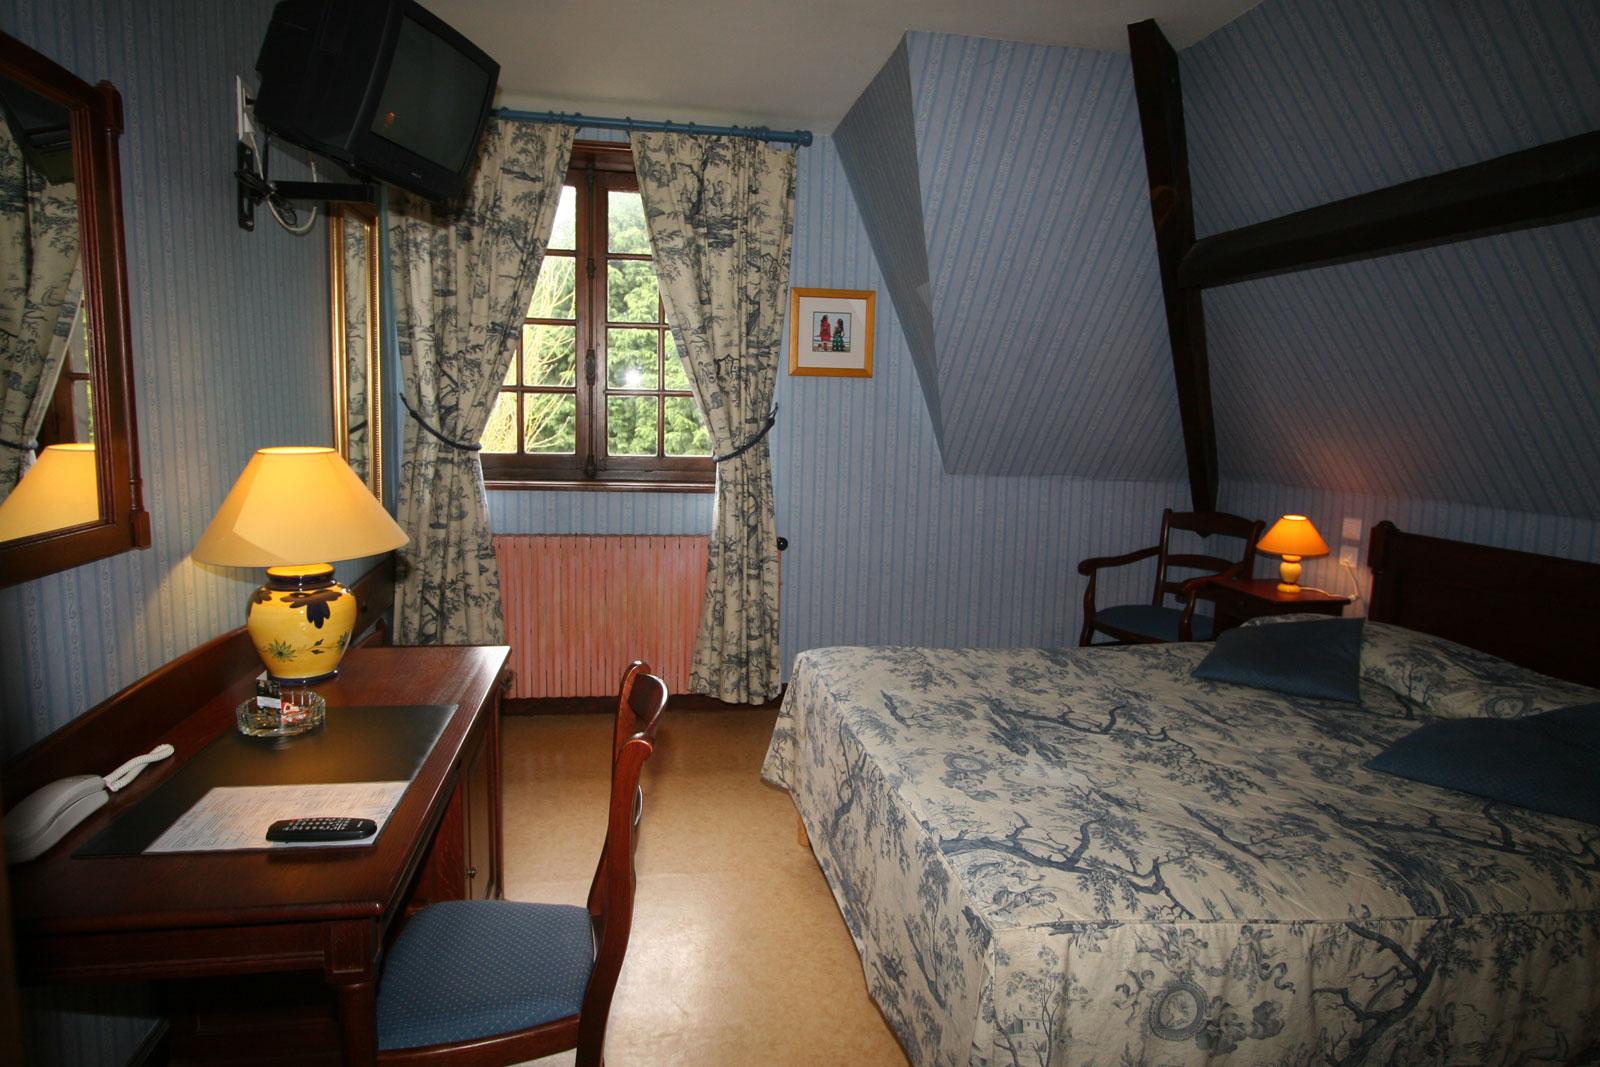 hotel-treport-011